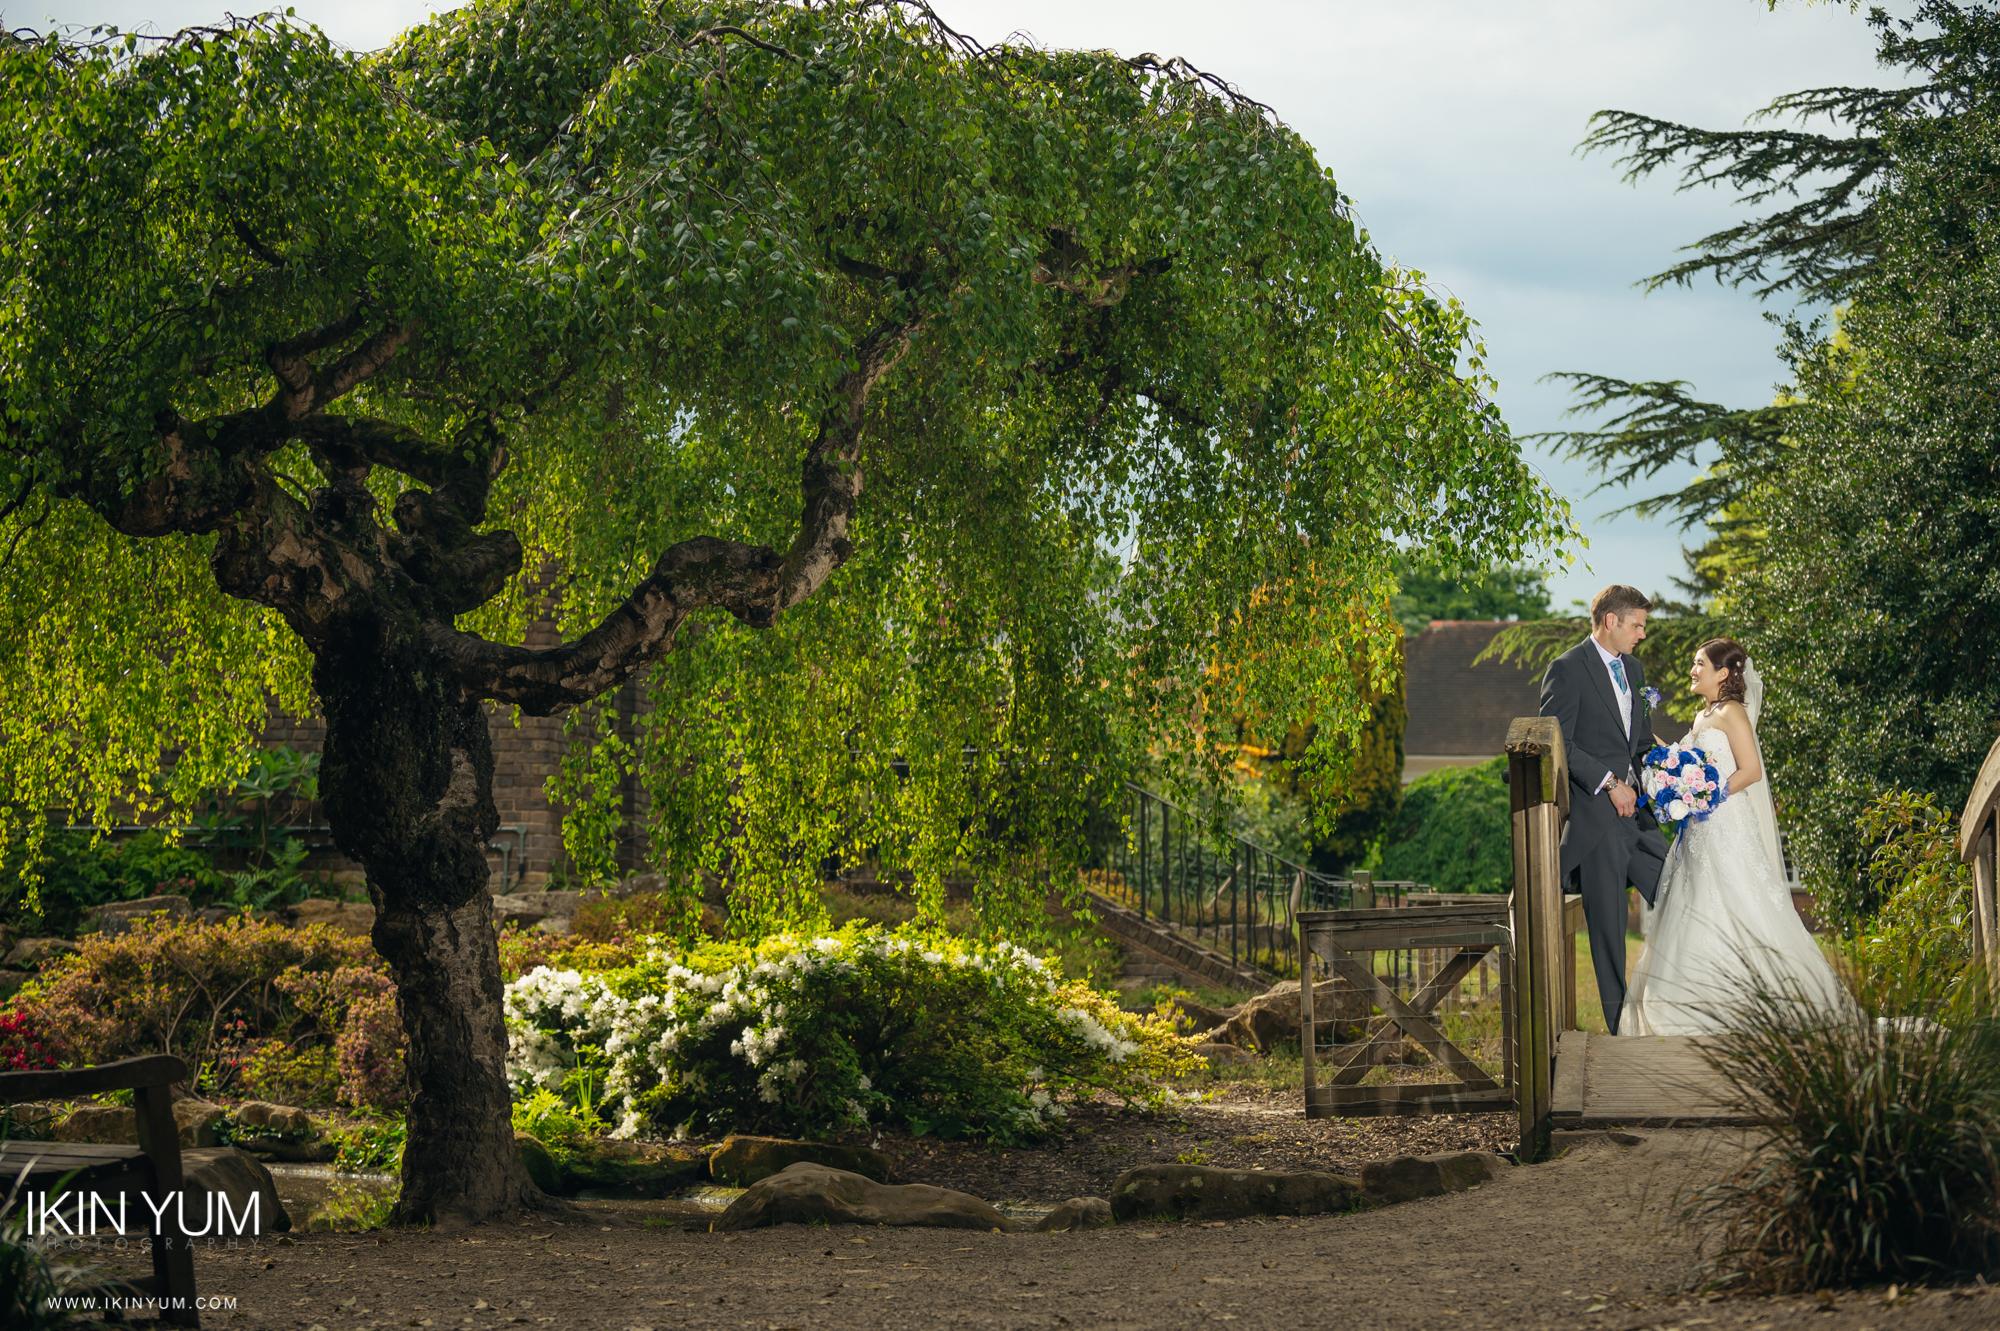 Teresa & Johnathan Weddong Day - Couple Photoshoot-0075.jpg